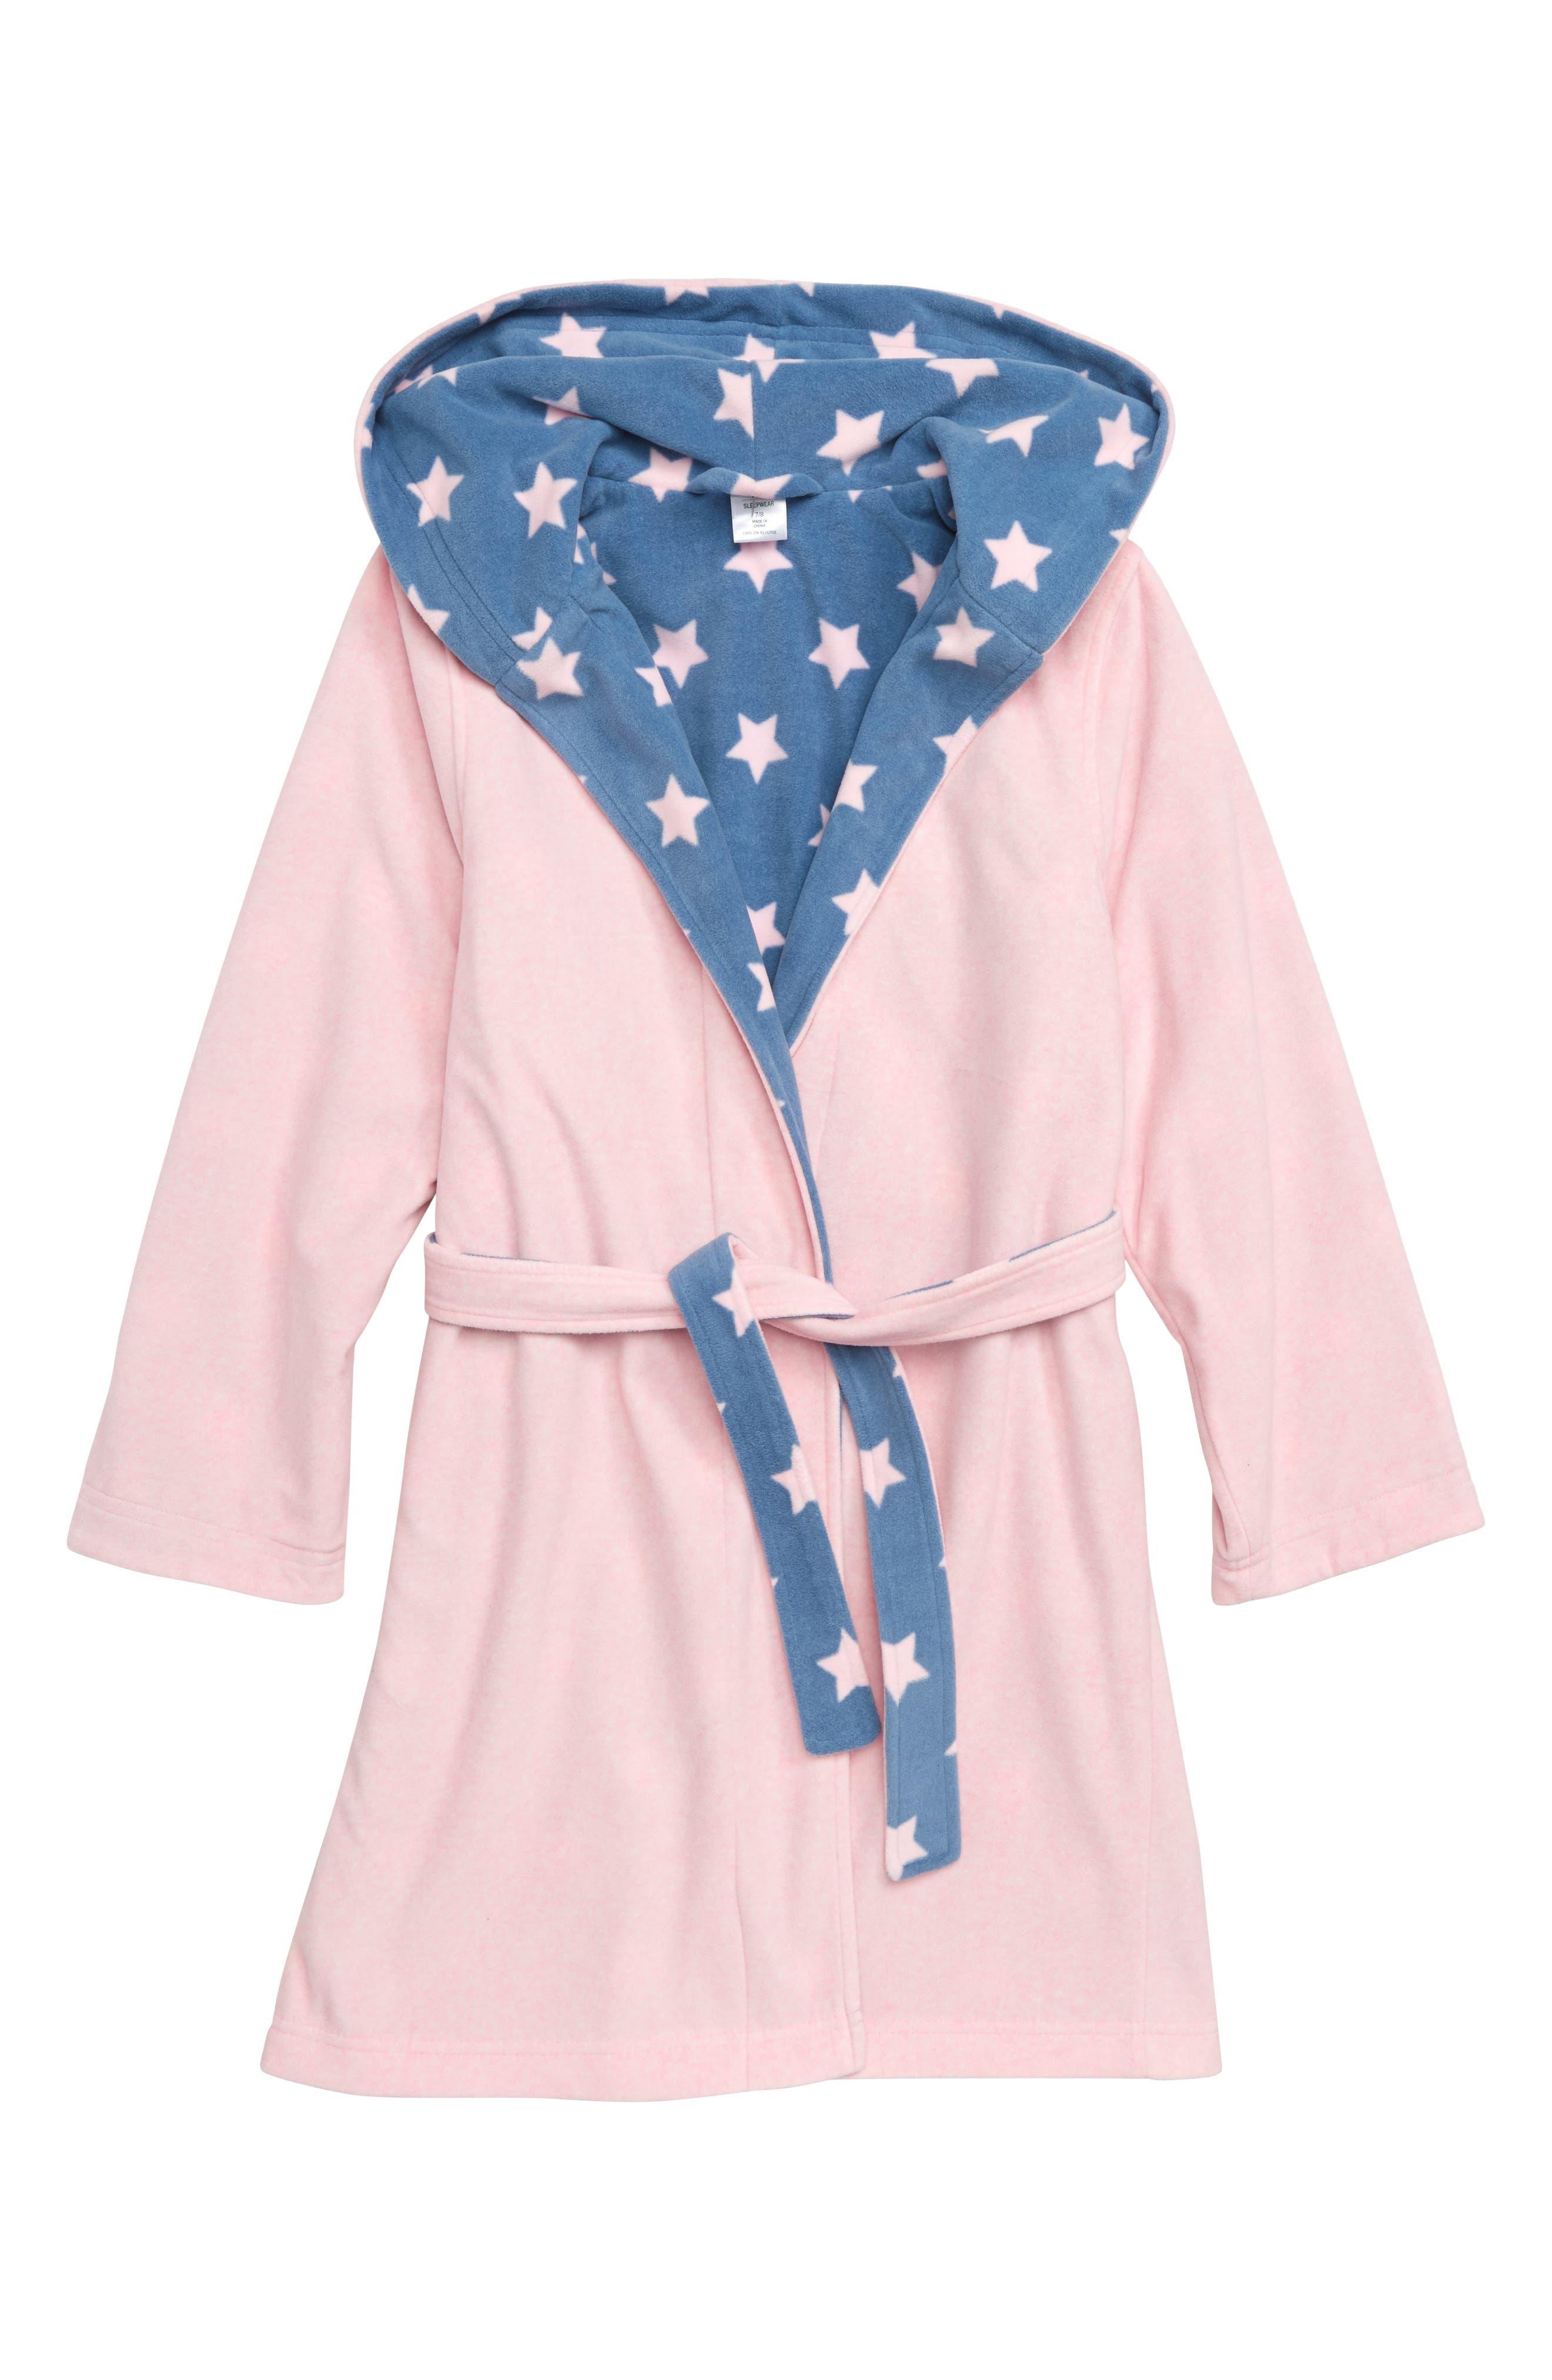 Reversible Fleece Robe,                             Main thumbnail 1, color,                             PINK BABY HEATHER STARS